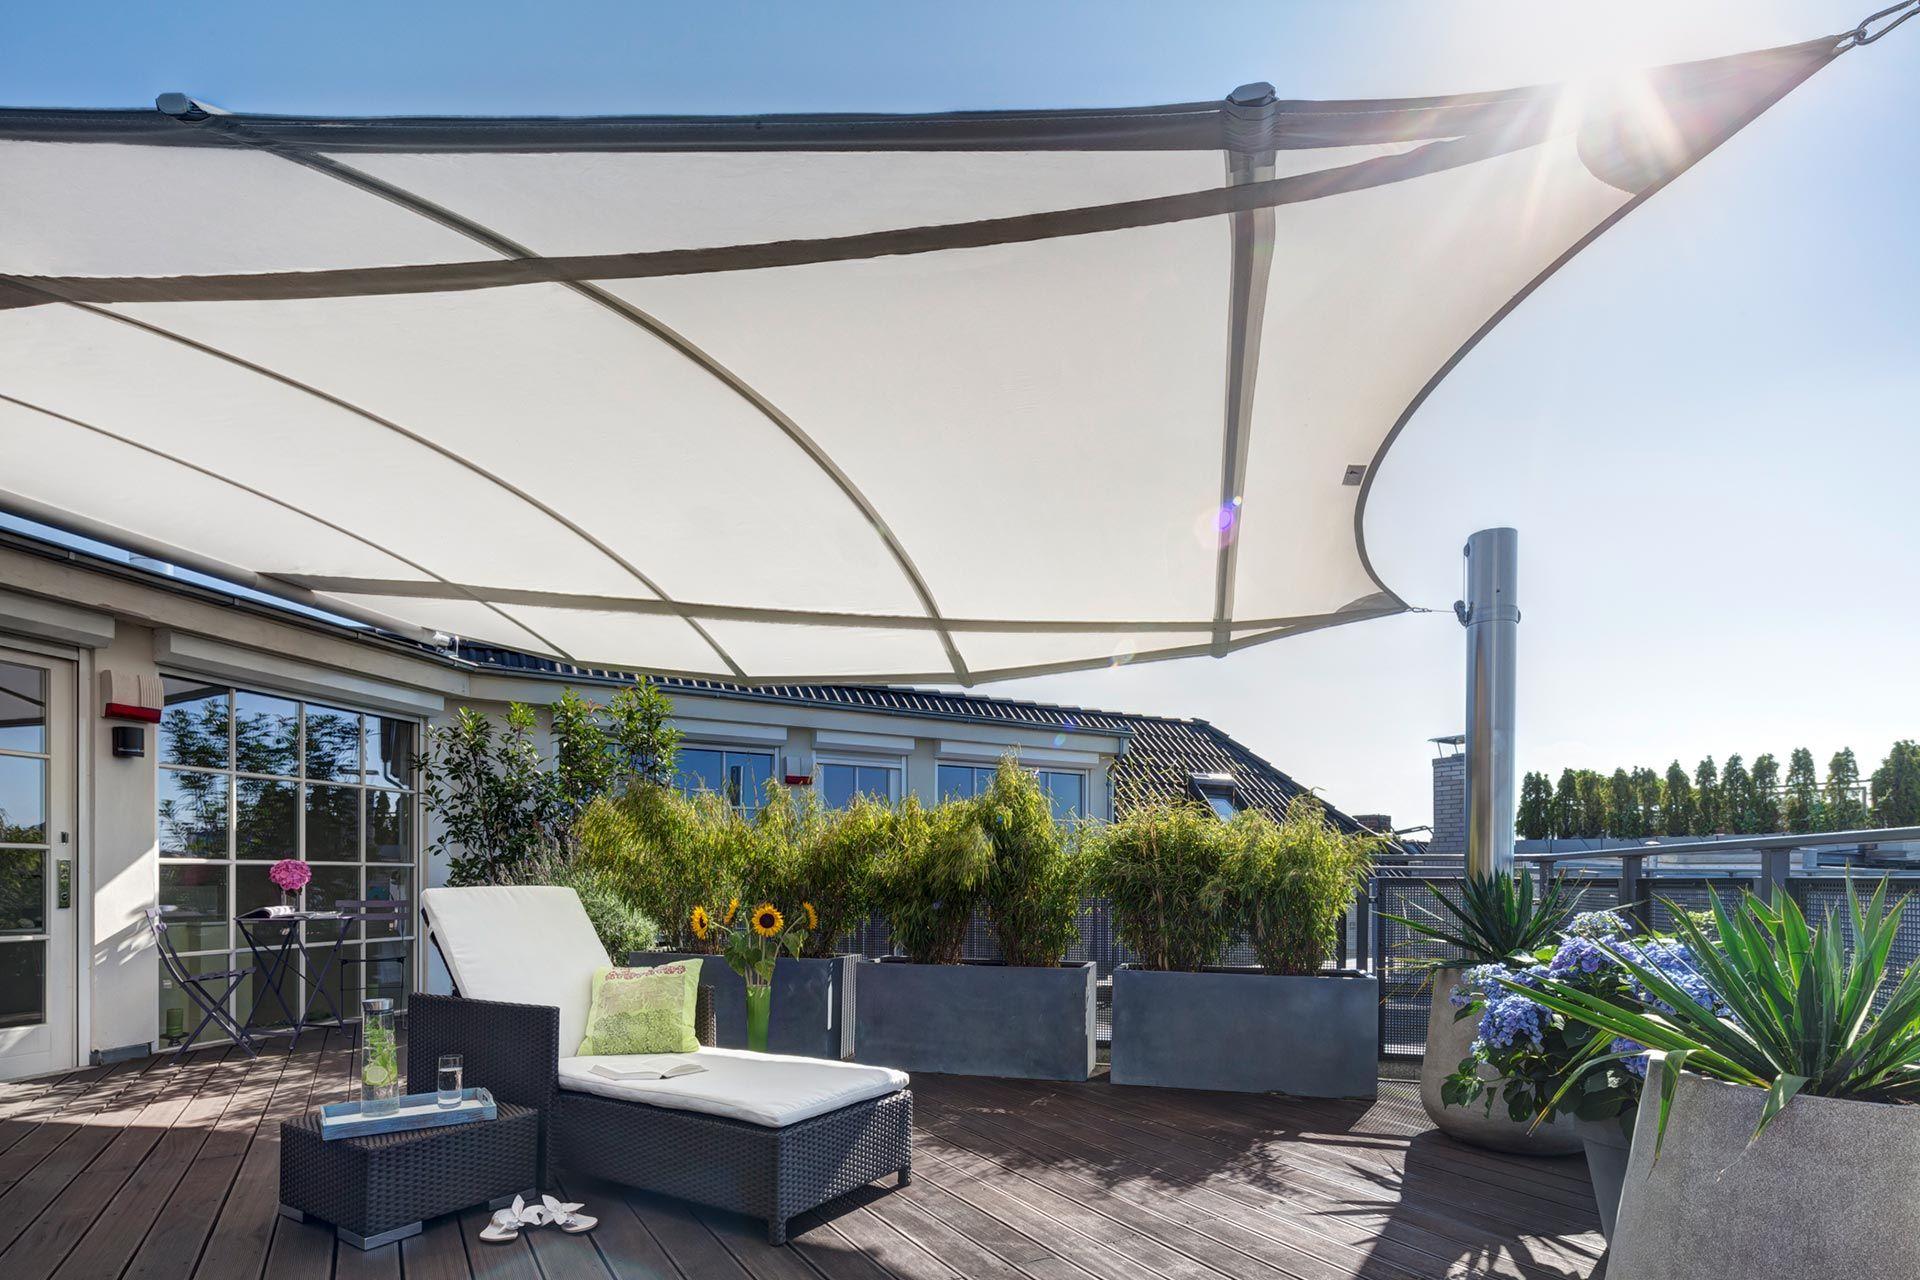 trapez4sun high end sonnensegel dachterrasse. Black Bedroom Furniture Sets. Home Design Ideas